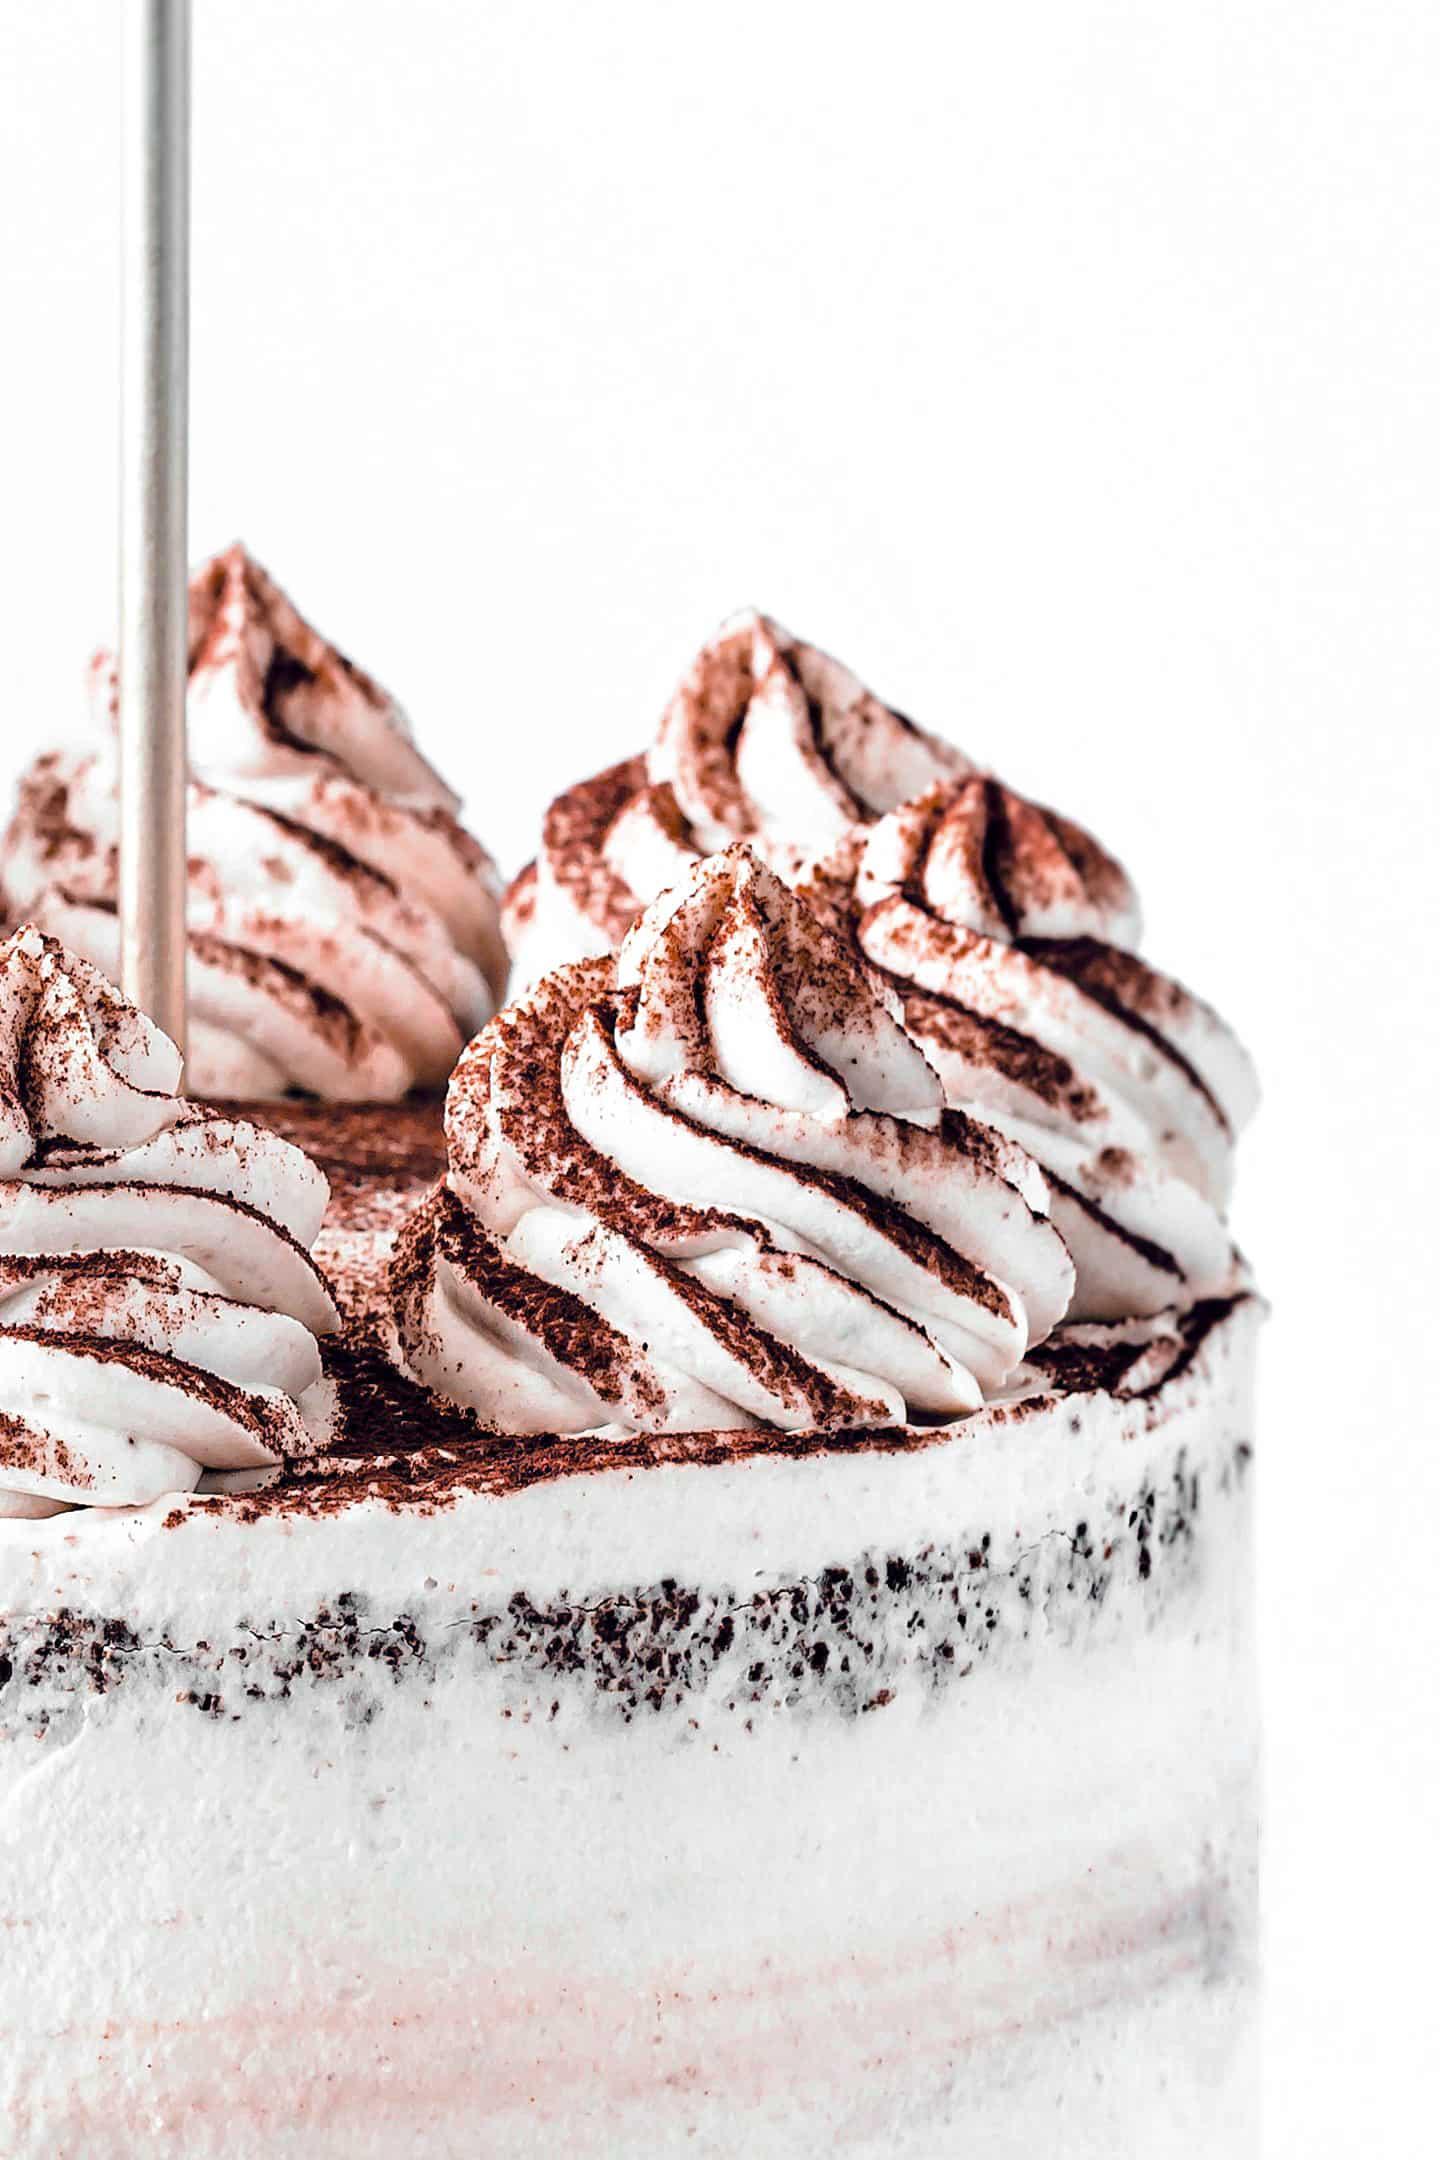 Layer cake au chocolat et ganache montée au chocolat blanc